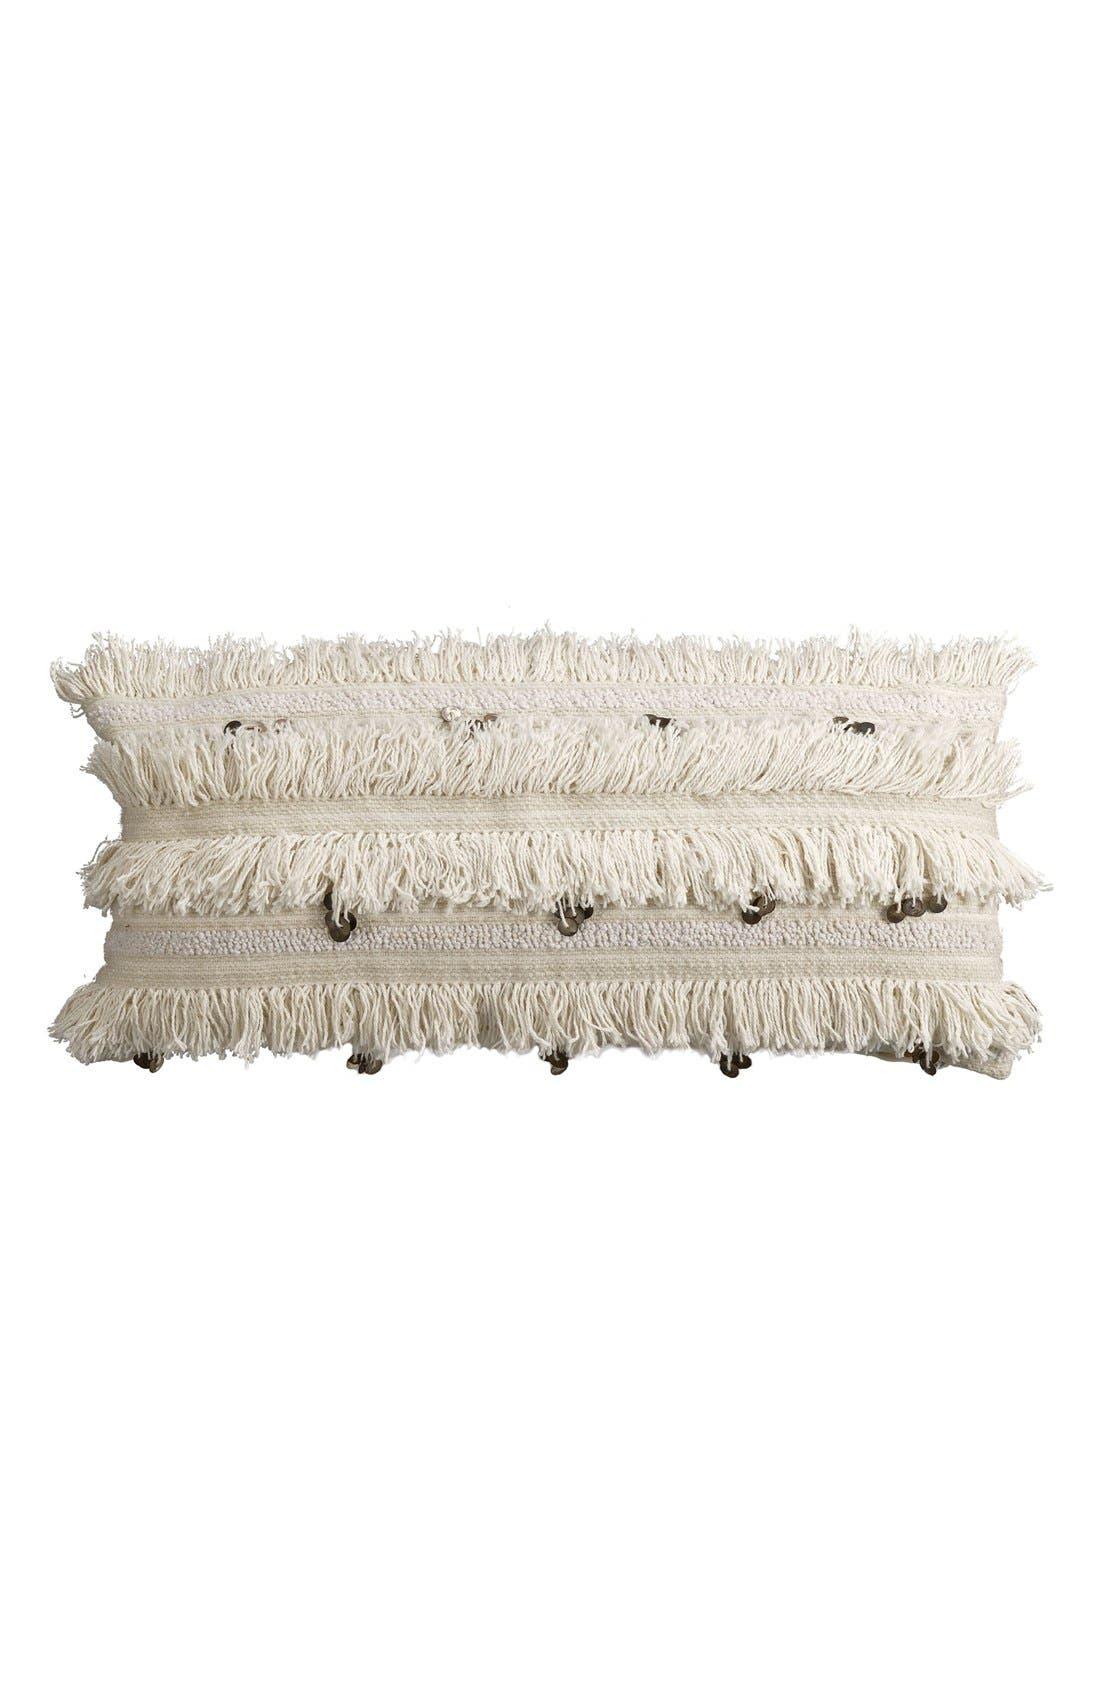 Fringe Sequin Accent Pillow,                             Main thumbnail 1, color,                             Ivory